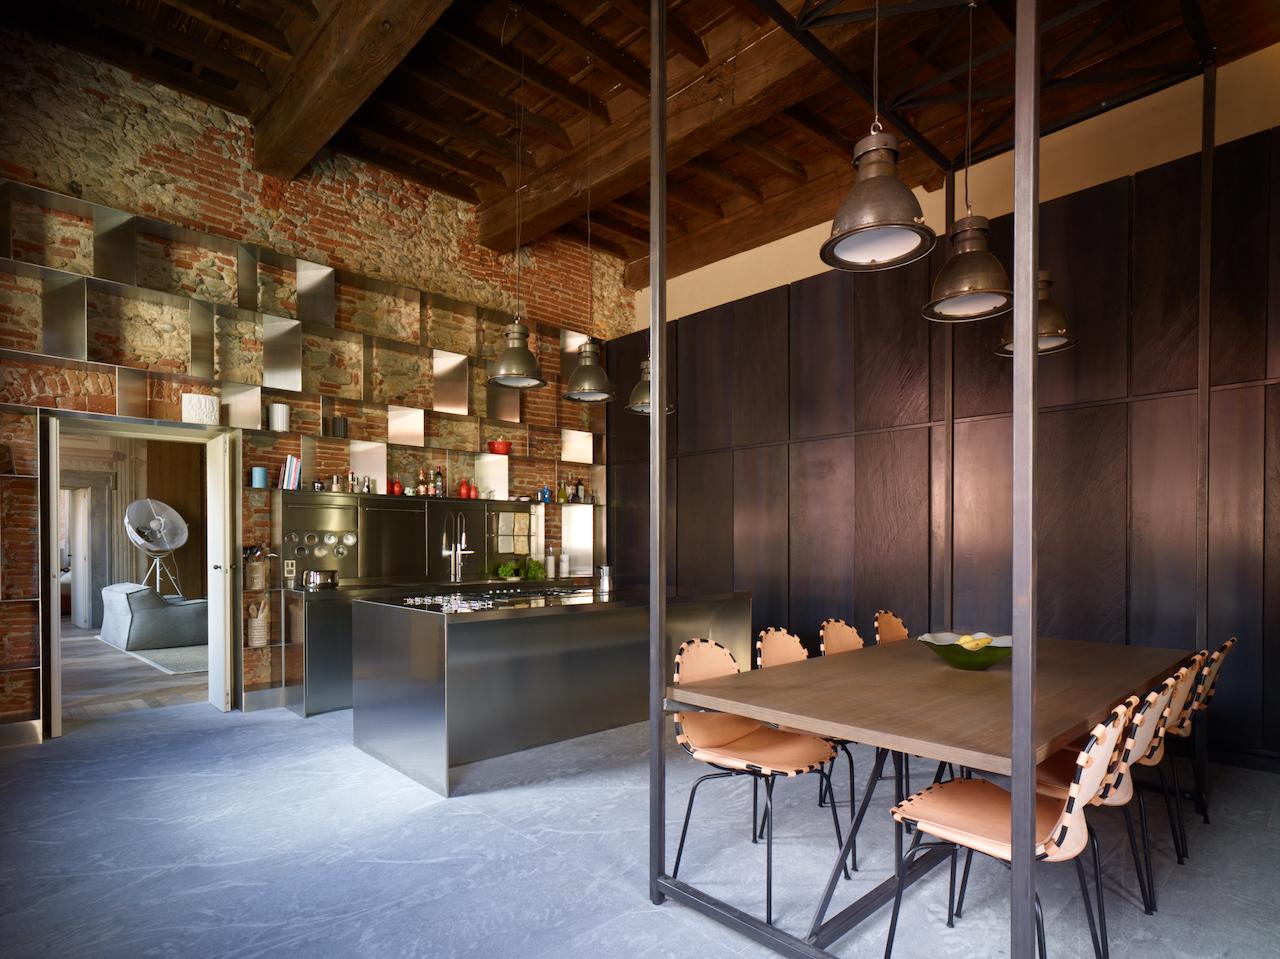 Da abimis una cucina industriale pensata per la casa - Cucine stile industriale ...